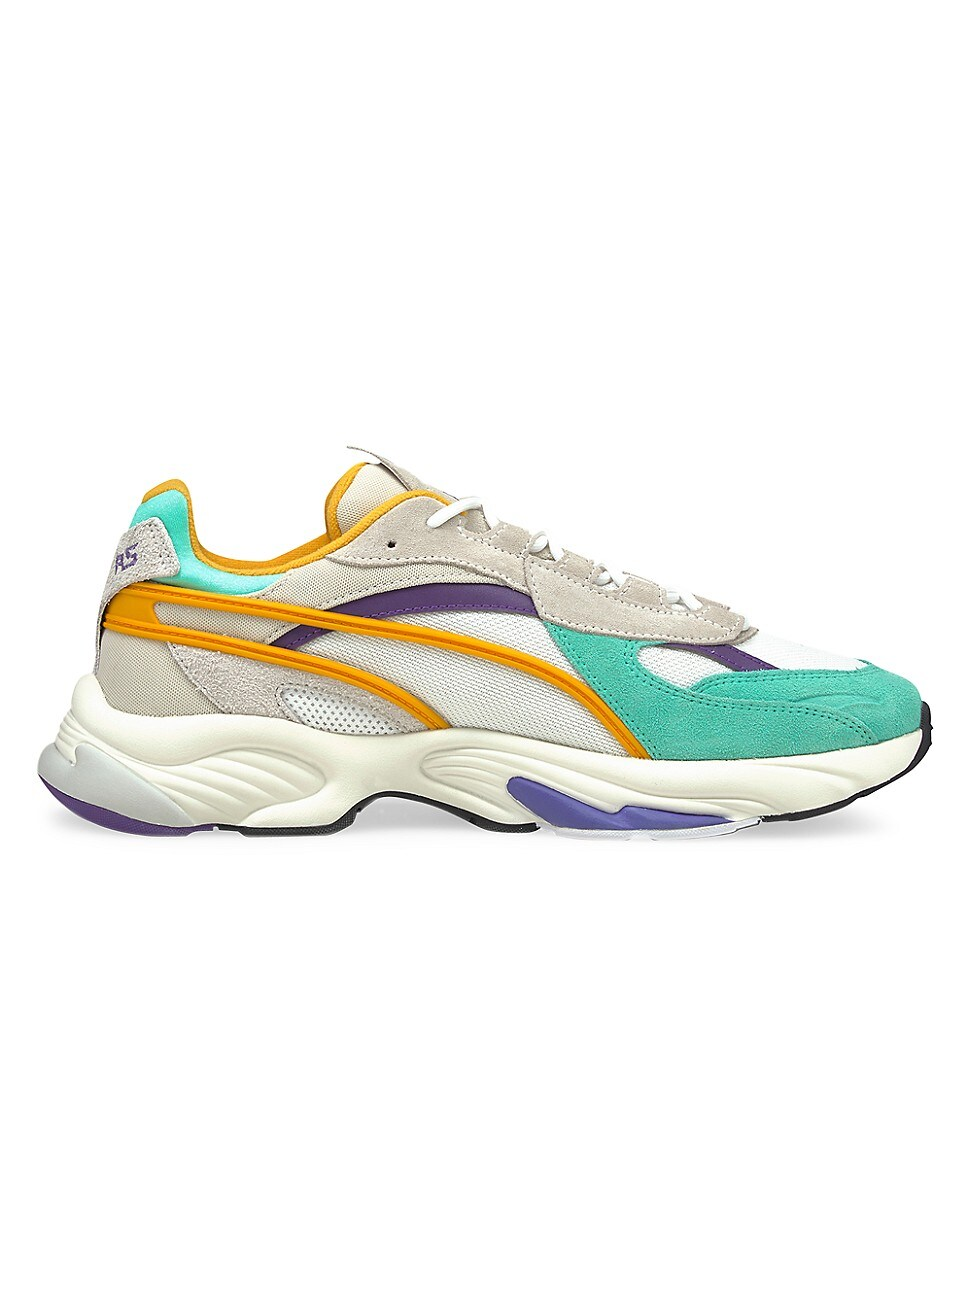 Puma Sneakers MEN'S MEN'S RS CONNECT SNEAKERS